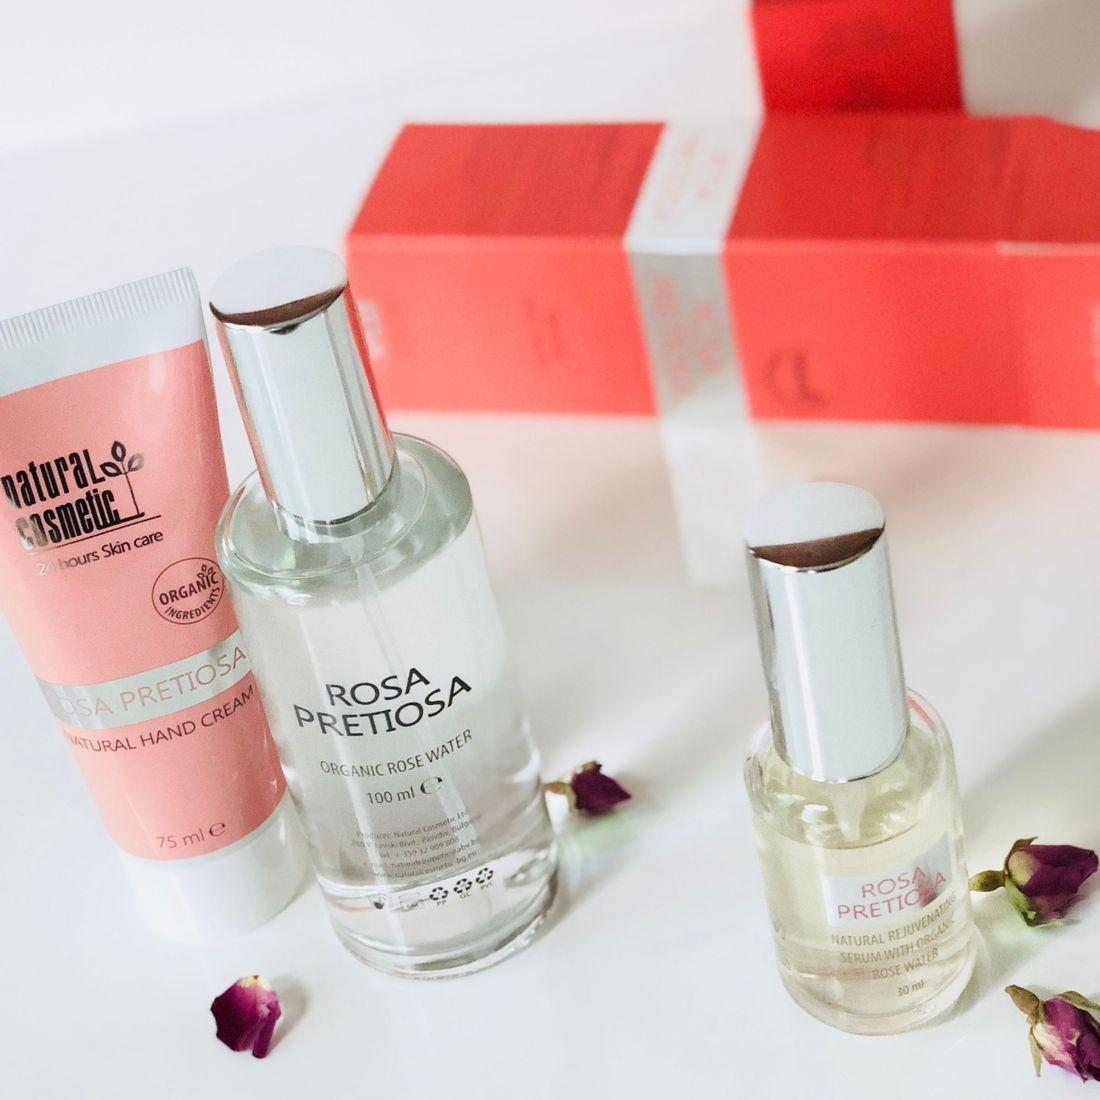 Rosa Pretiosa, RosePost Box, Bulgarian Rose Water, RosePost Blog, Rose Skincare, Rose Beauty, Rose-infused beauty, RosePost Spring Box